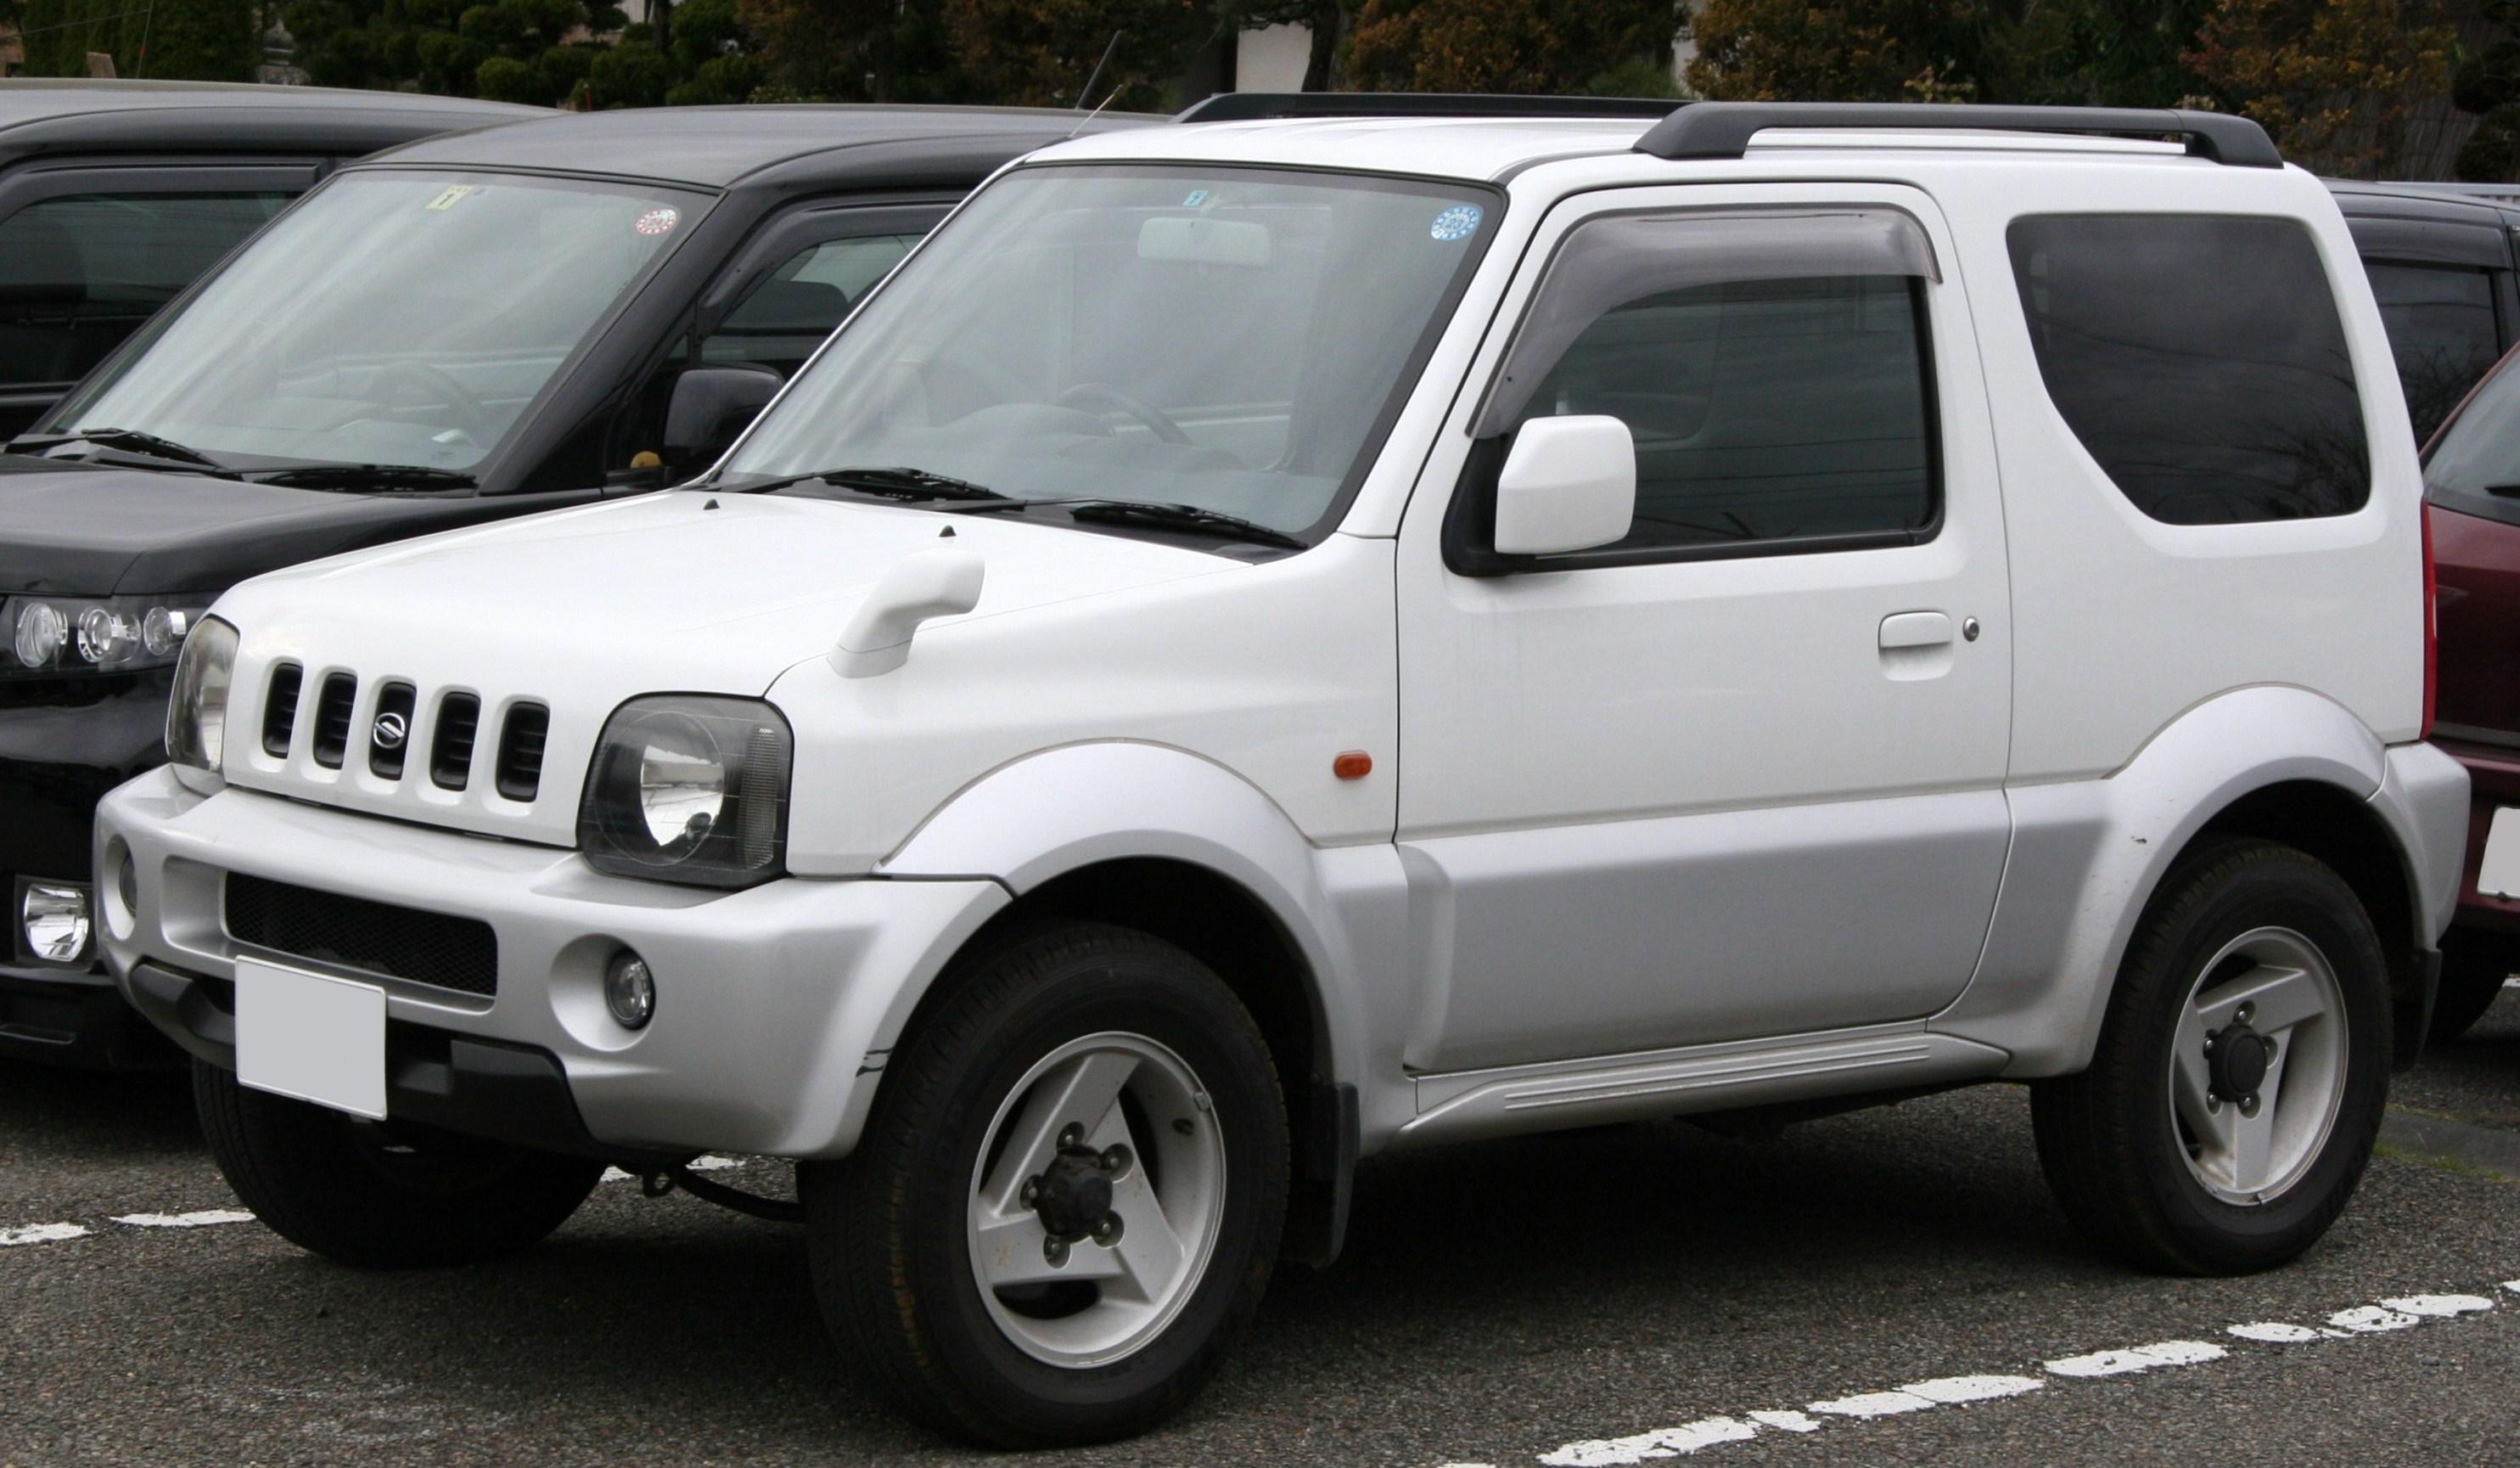 Suzuki Jeep Price In Pakistan